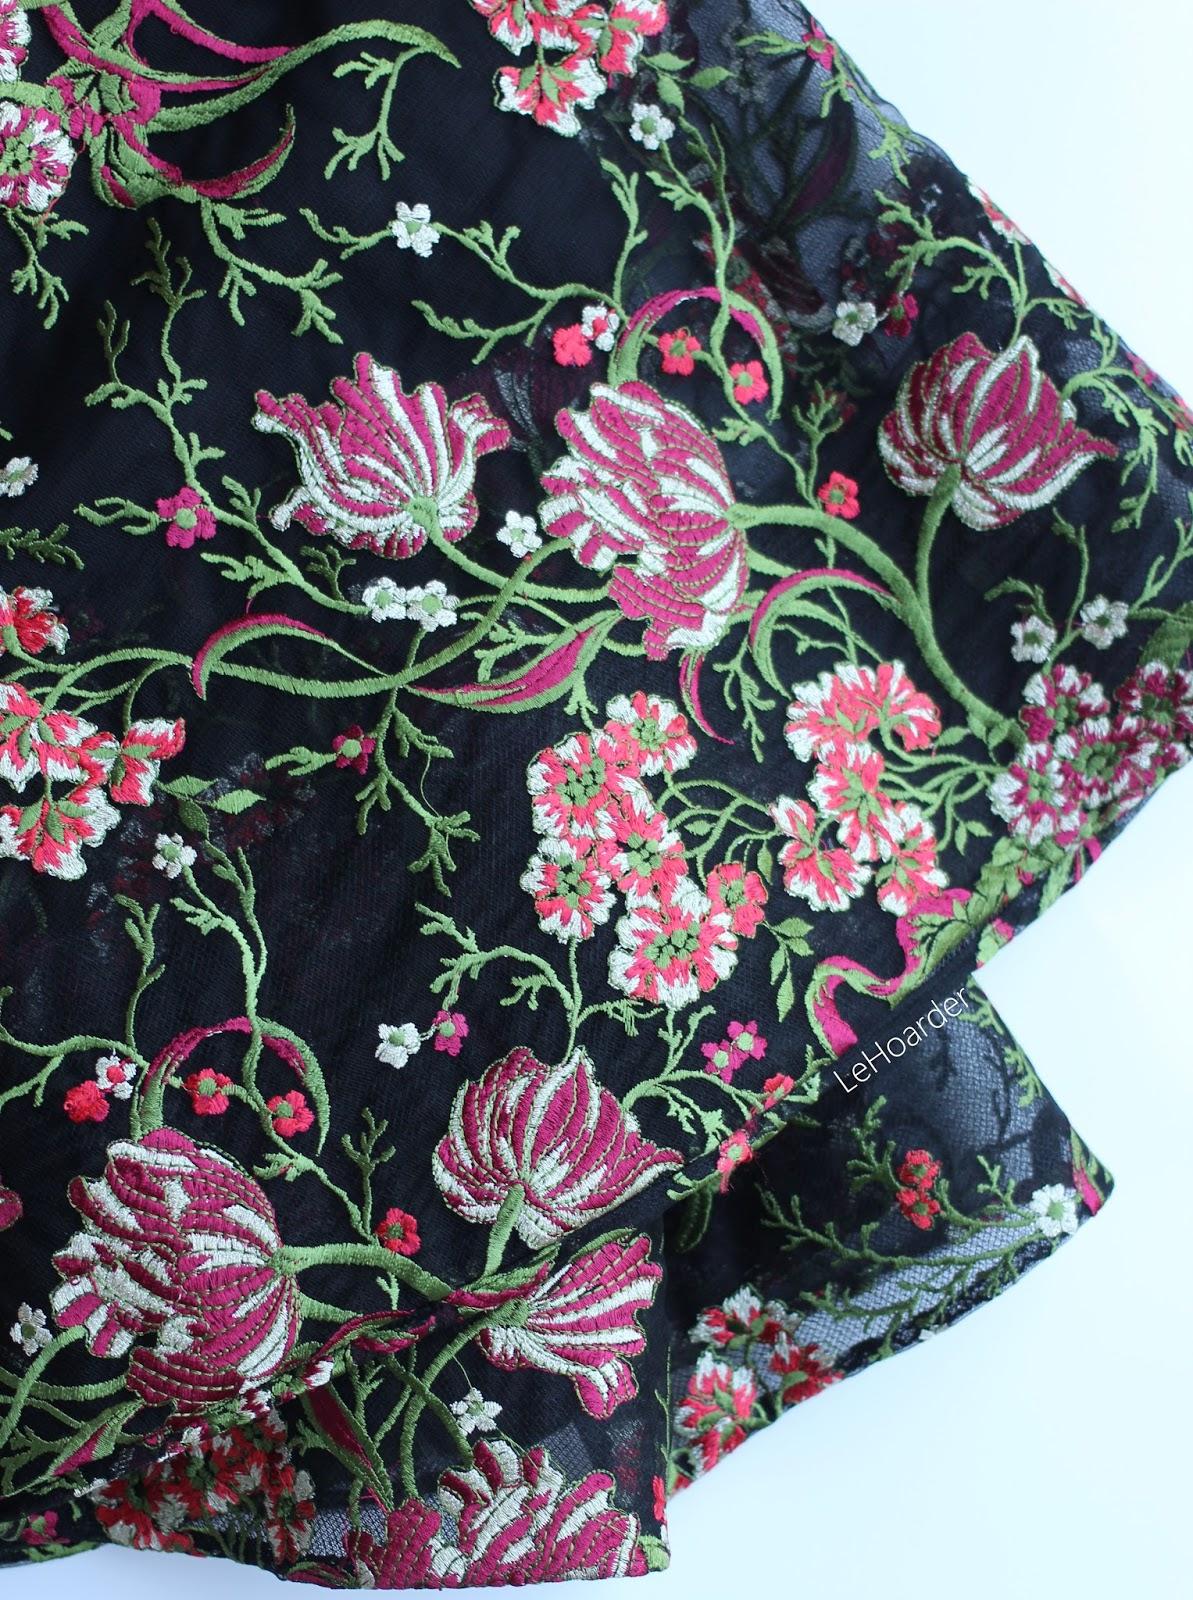 Racks and Racks of Modest Dresses at the Teri Jon Sample Sale ...